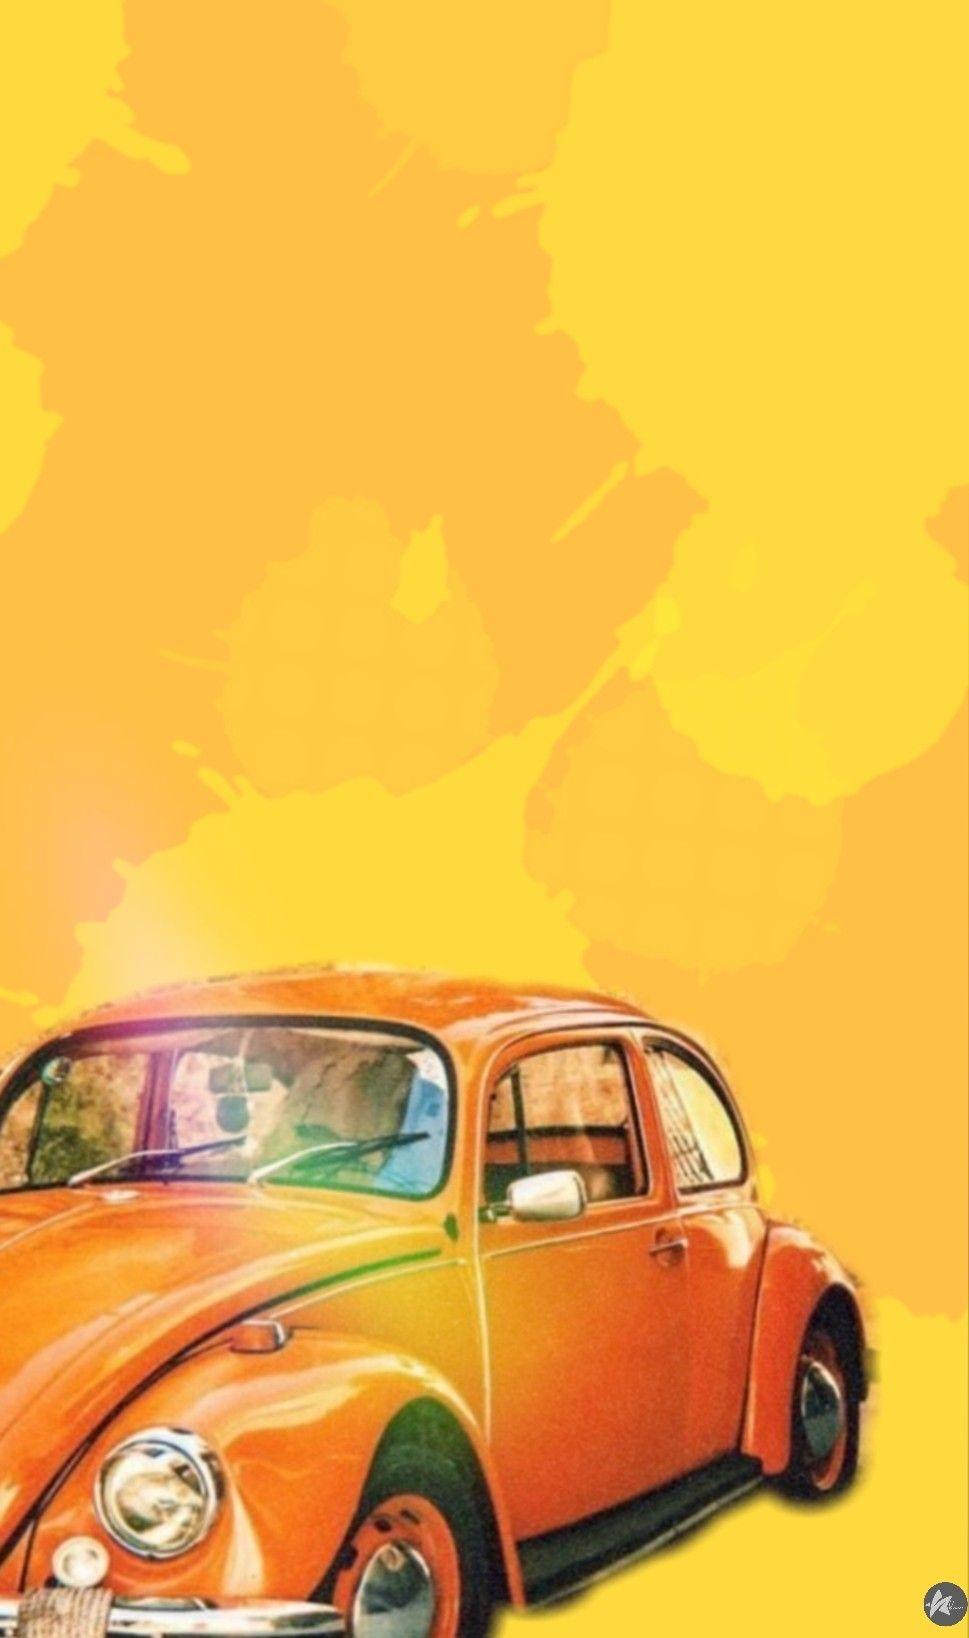 Beetle Car Wallpaper Background Wallpaper Backgrounds Car Iphone Wallpaper Wallpaper Iphone Cute